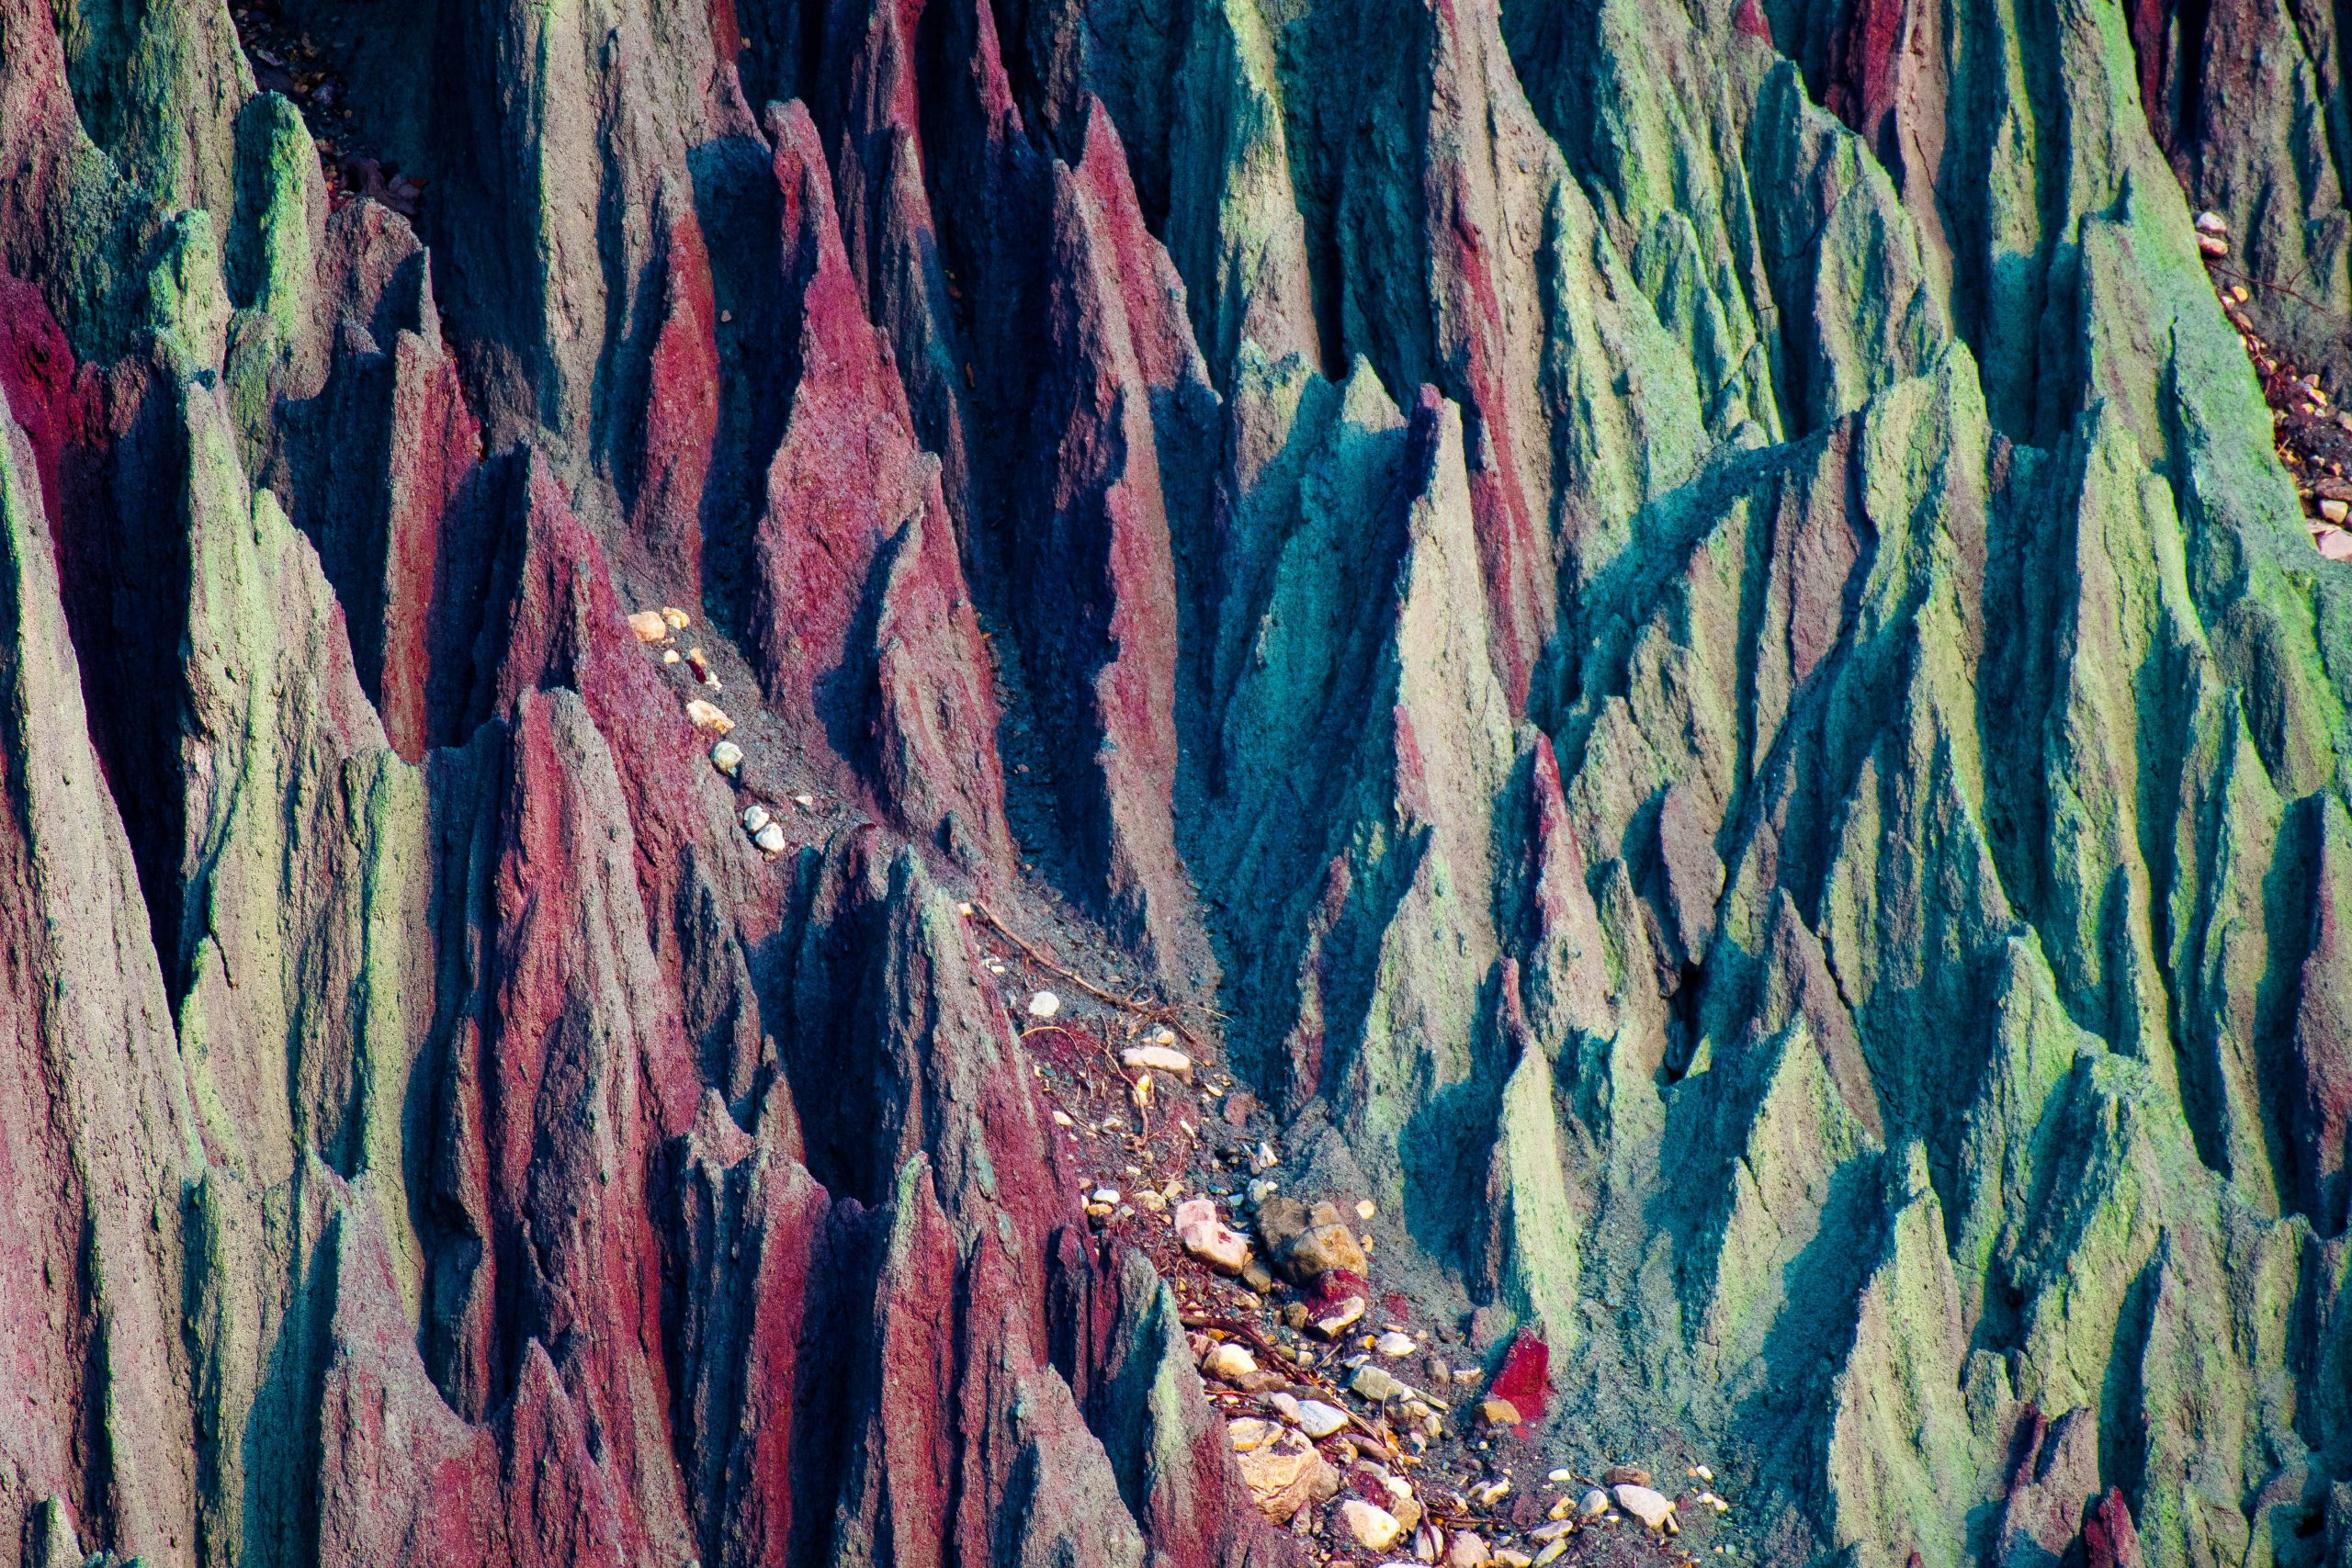 Pointed rocks of Himalaya